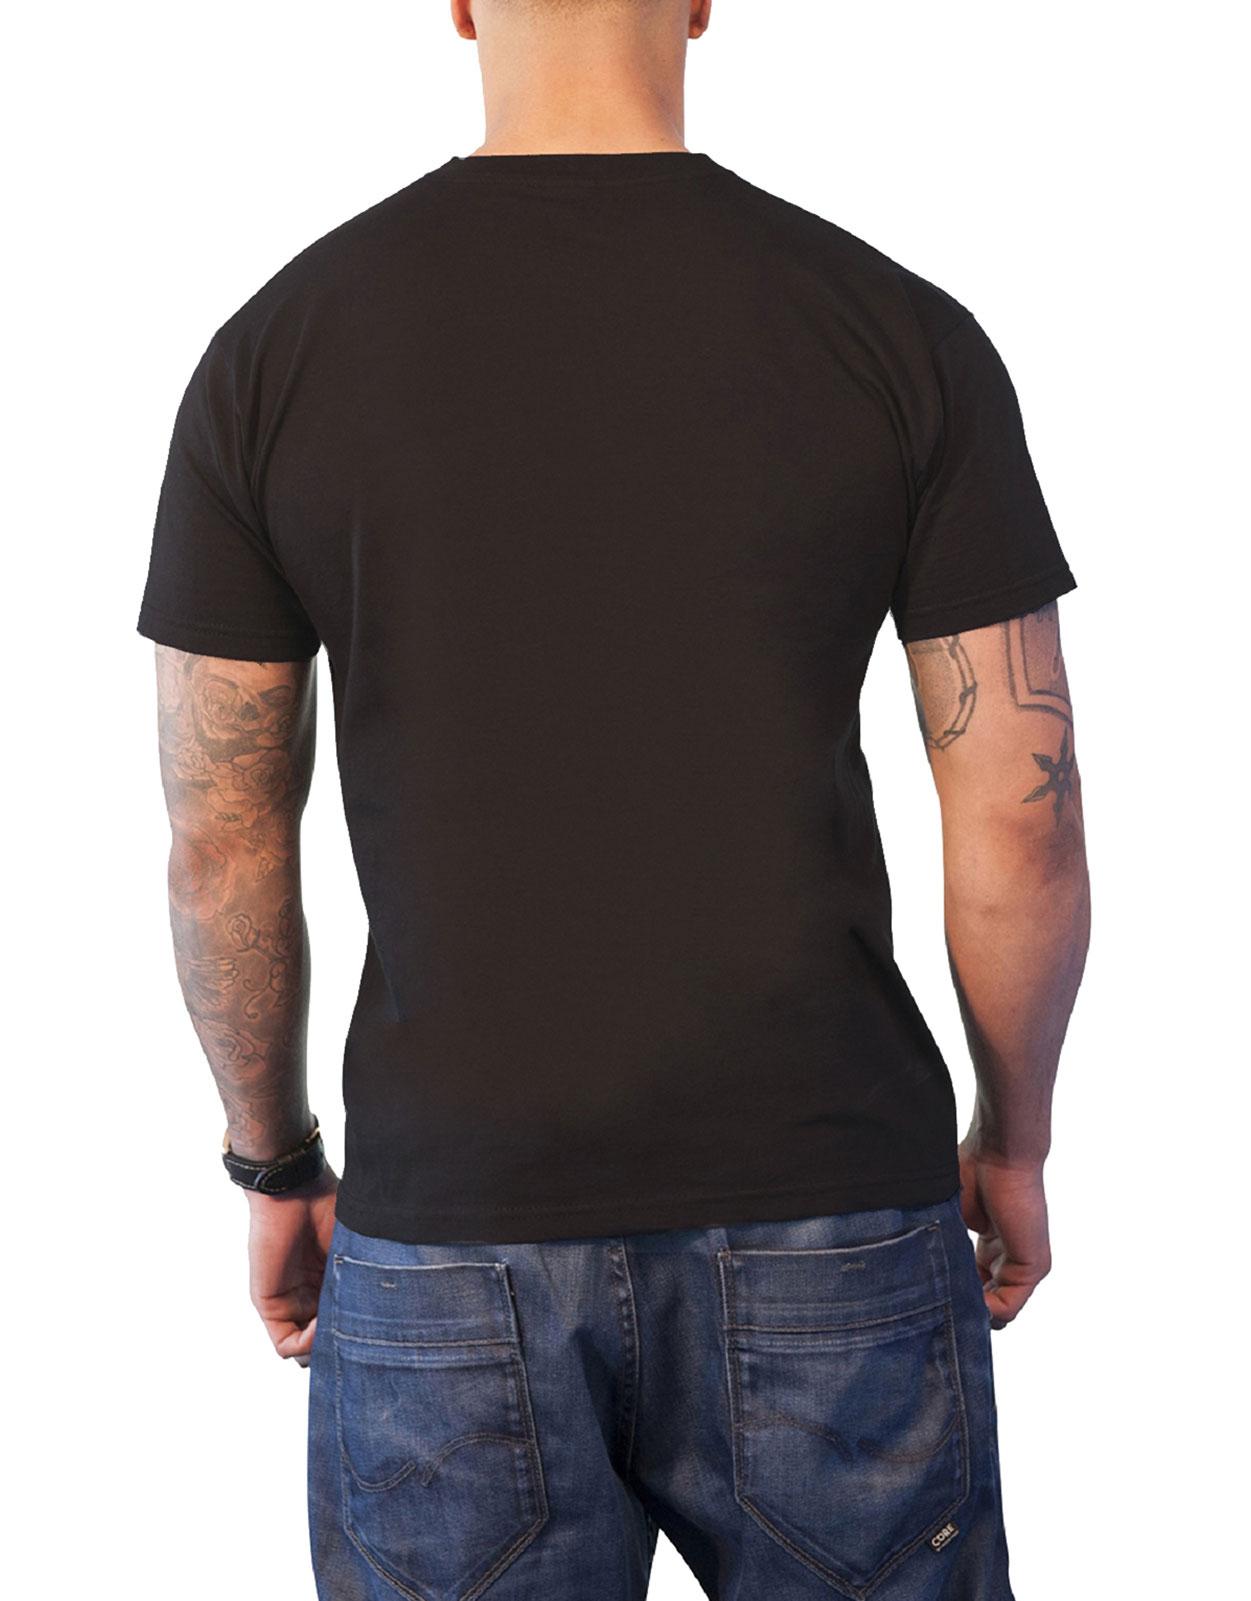 Camiseta-Last-Jedi-De-Star-Wars-Movie-Poster-porgs-Guardia-pretoriana-oficial-para-hombre miniatura 9